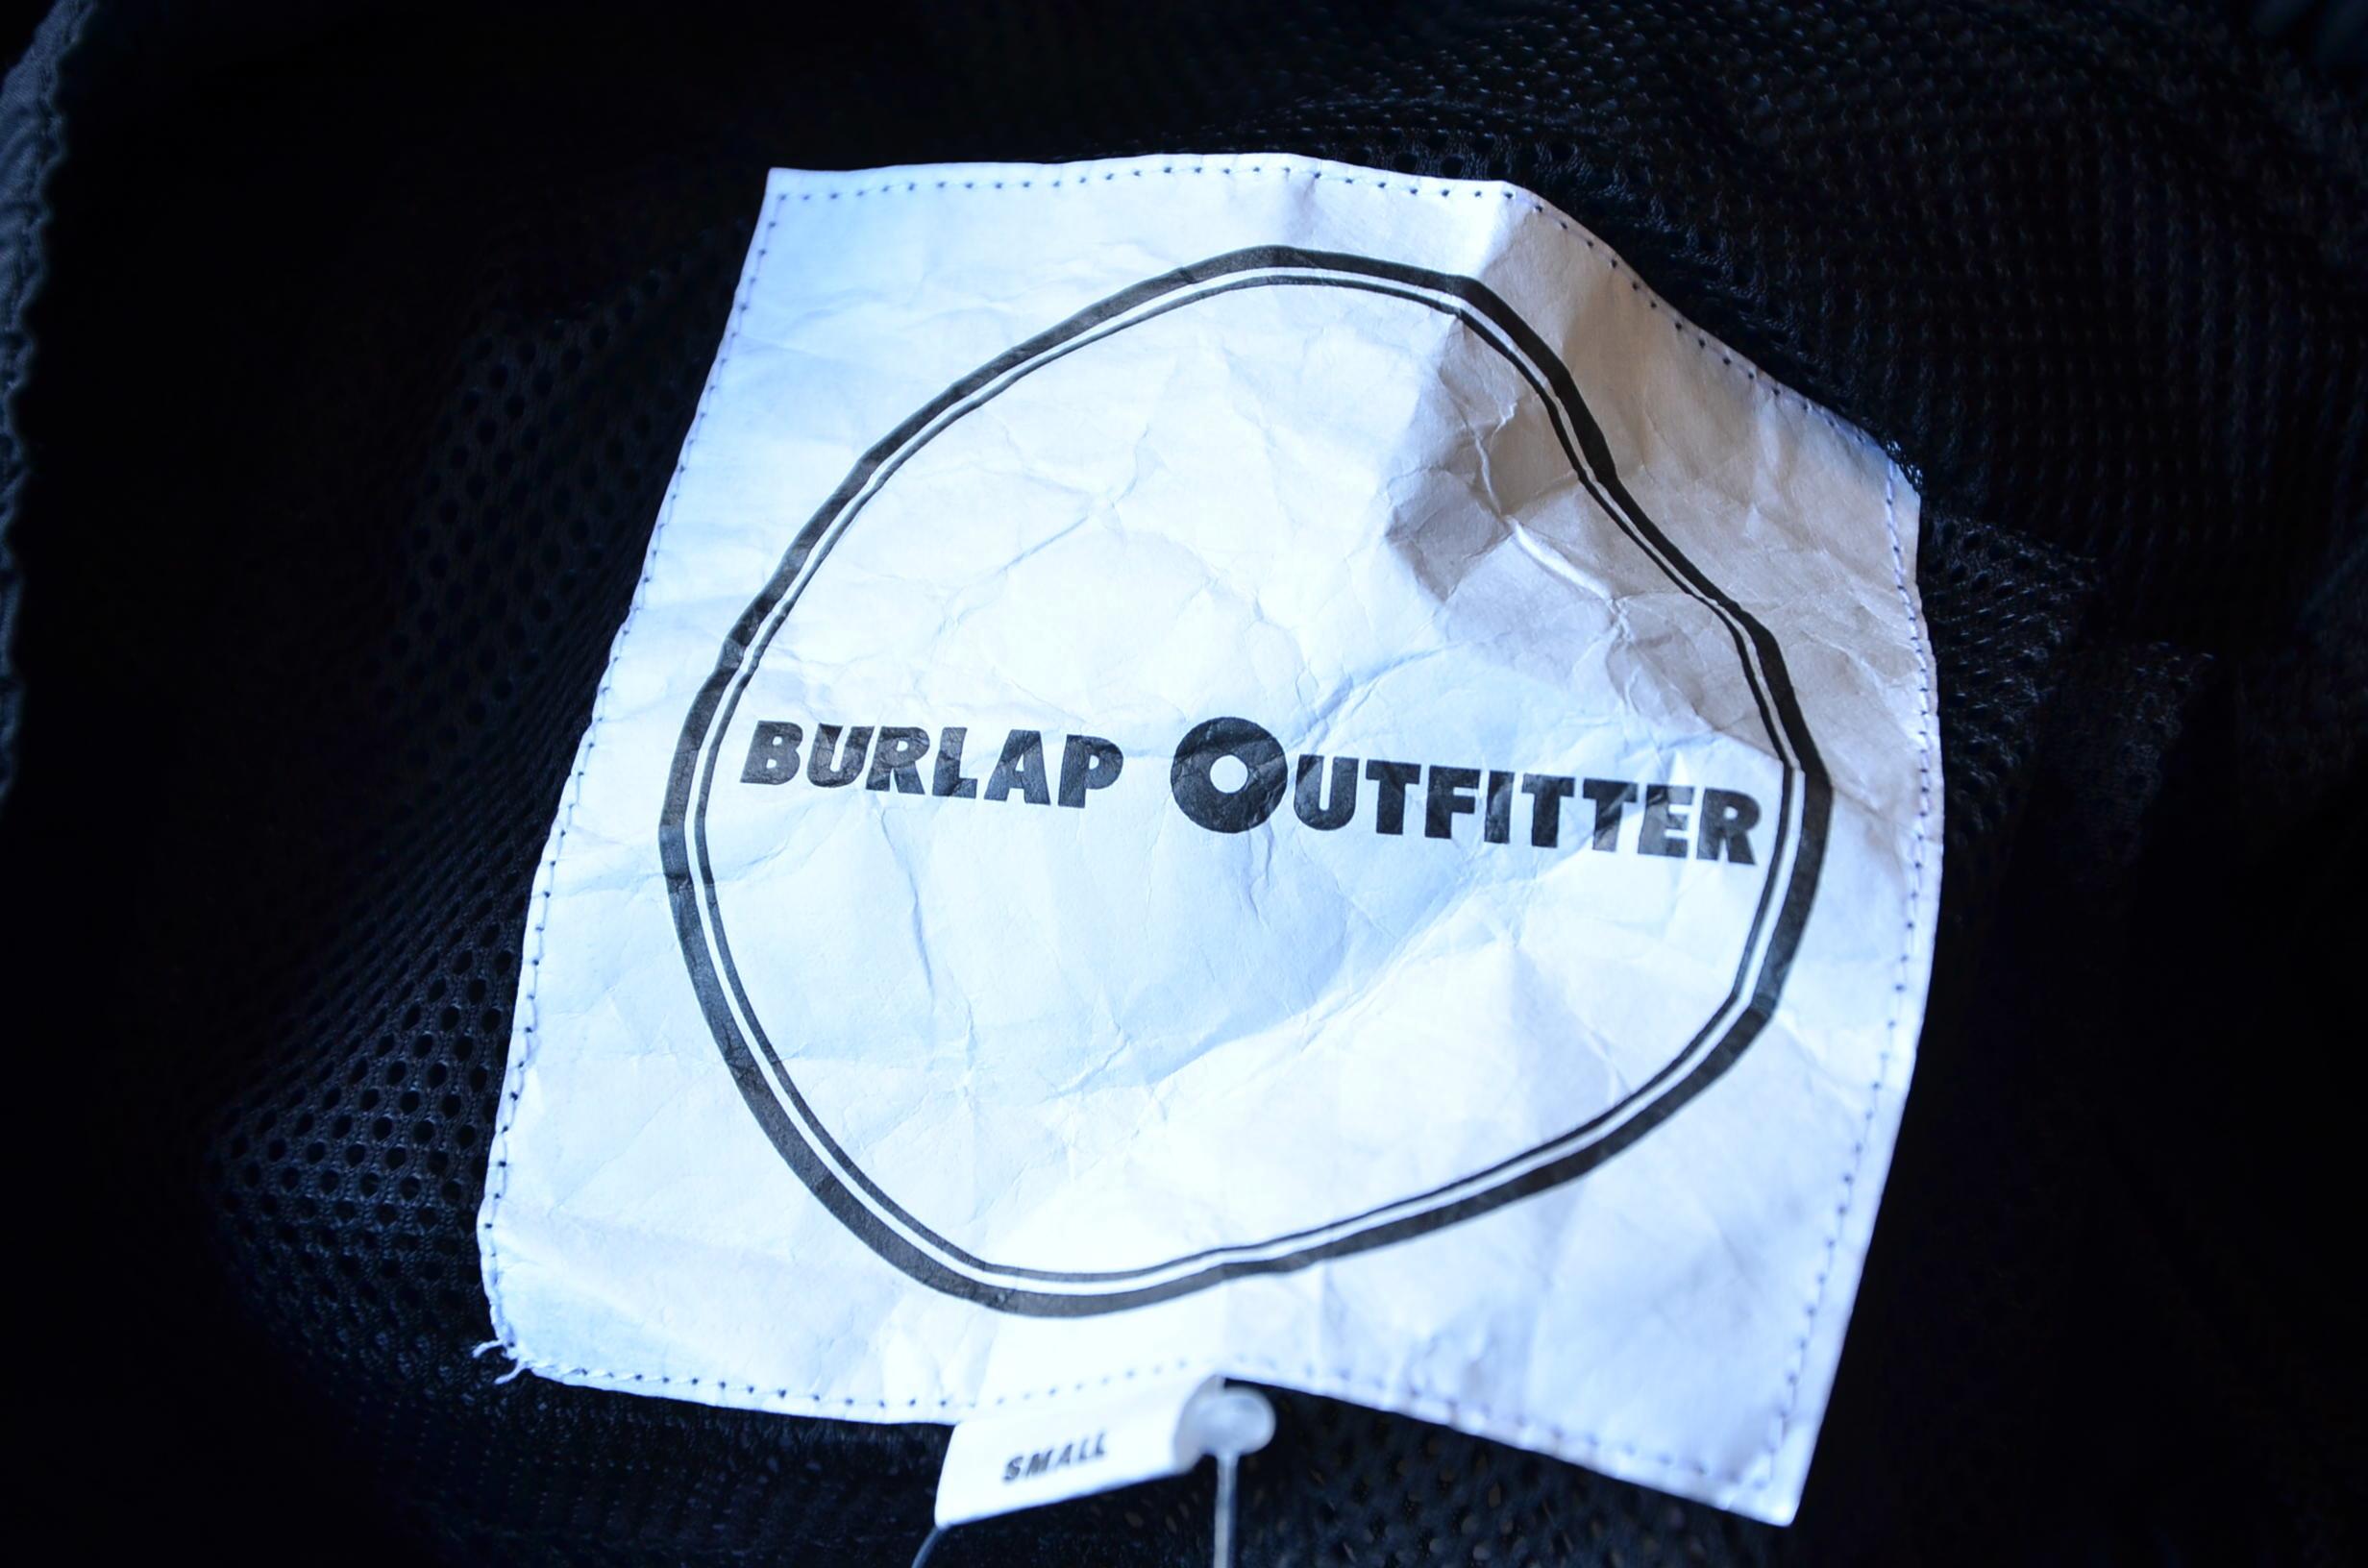 BURLAPのトラックパンツが今年も到着!!_c0167336_12292564.jpg